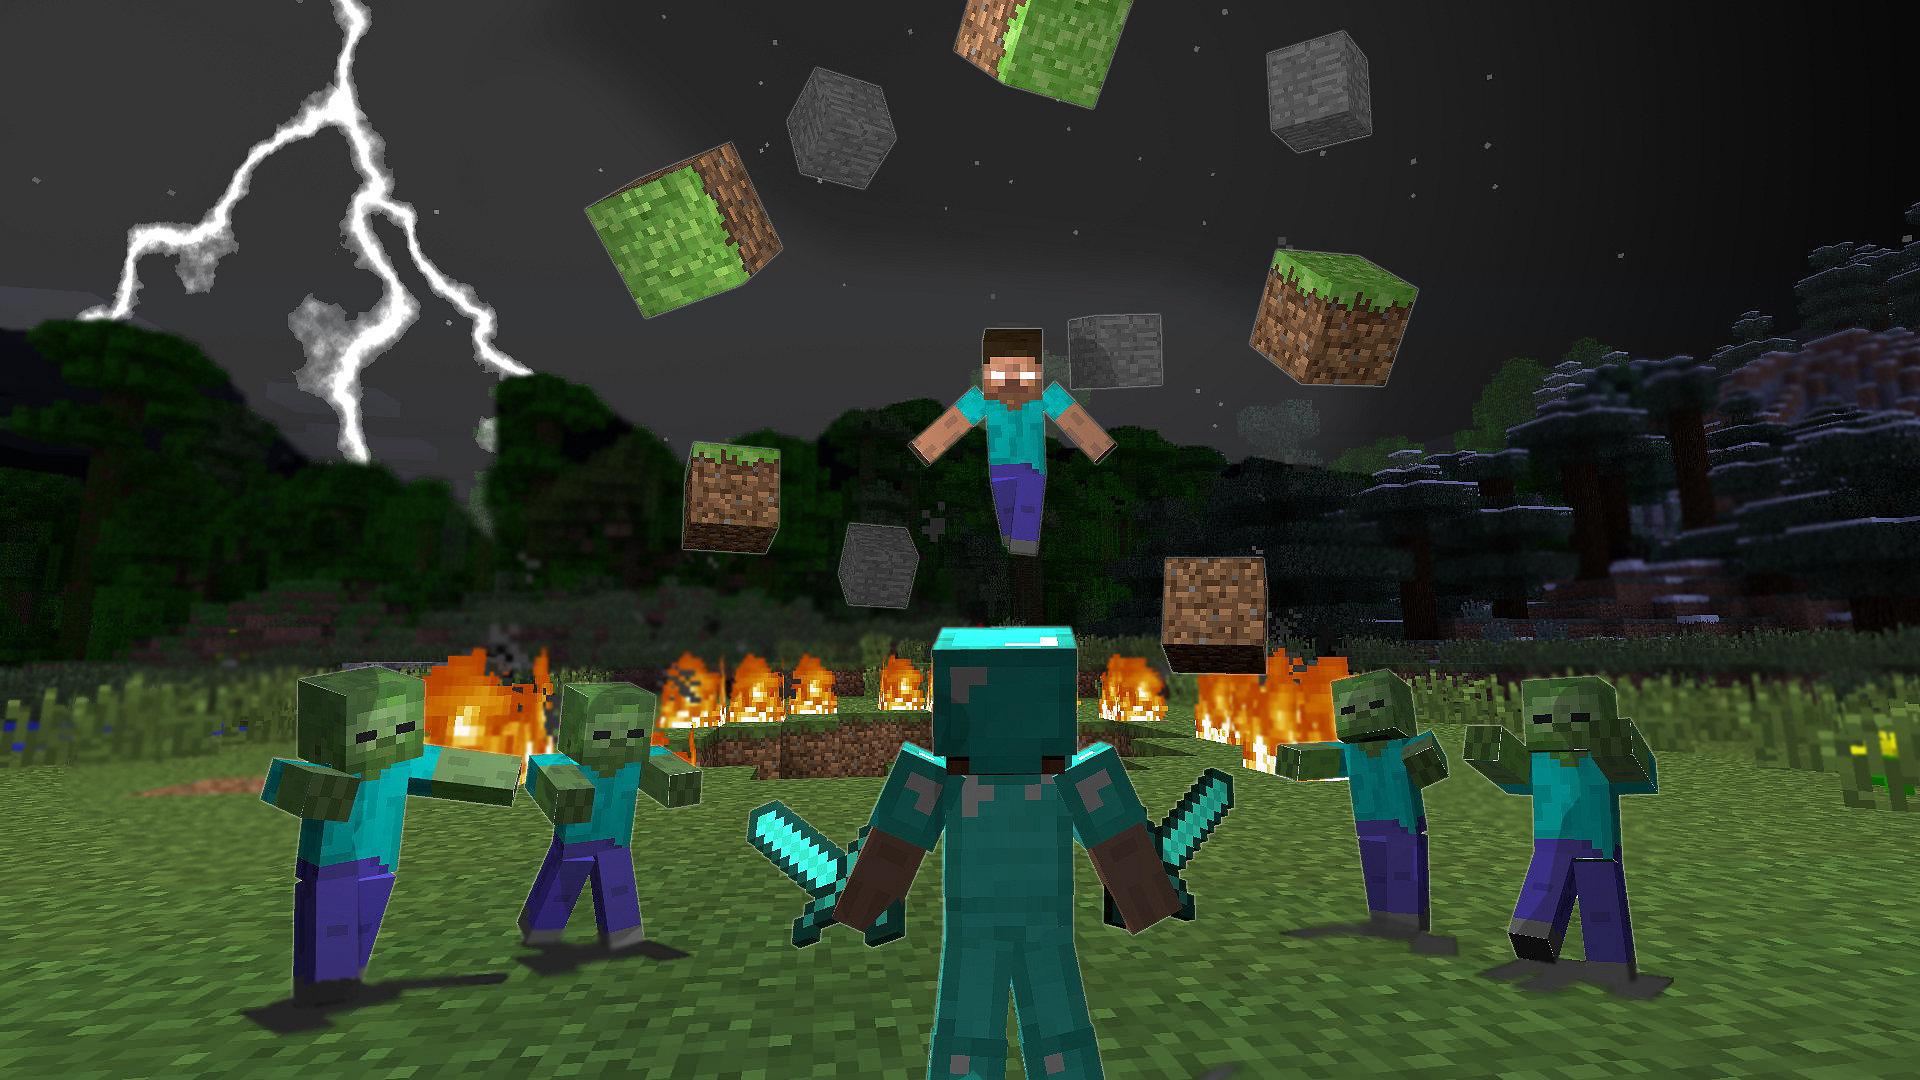 Plano De Fundo Minecraft: Minecraft : Fonds D'écrans